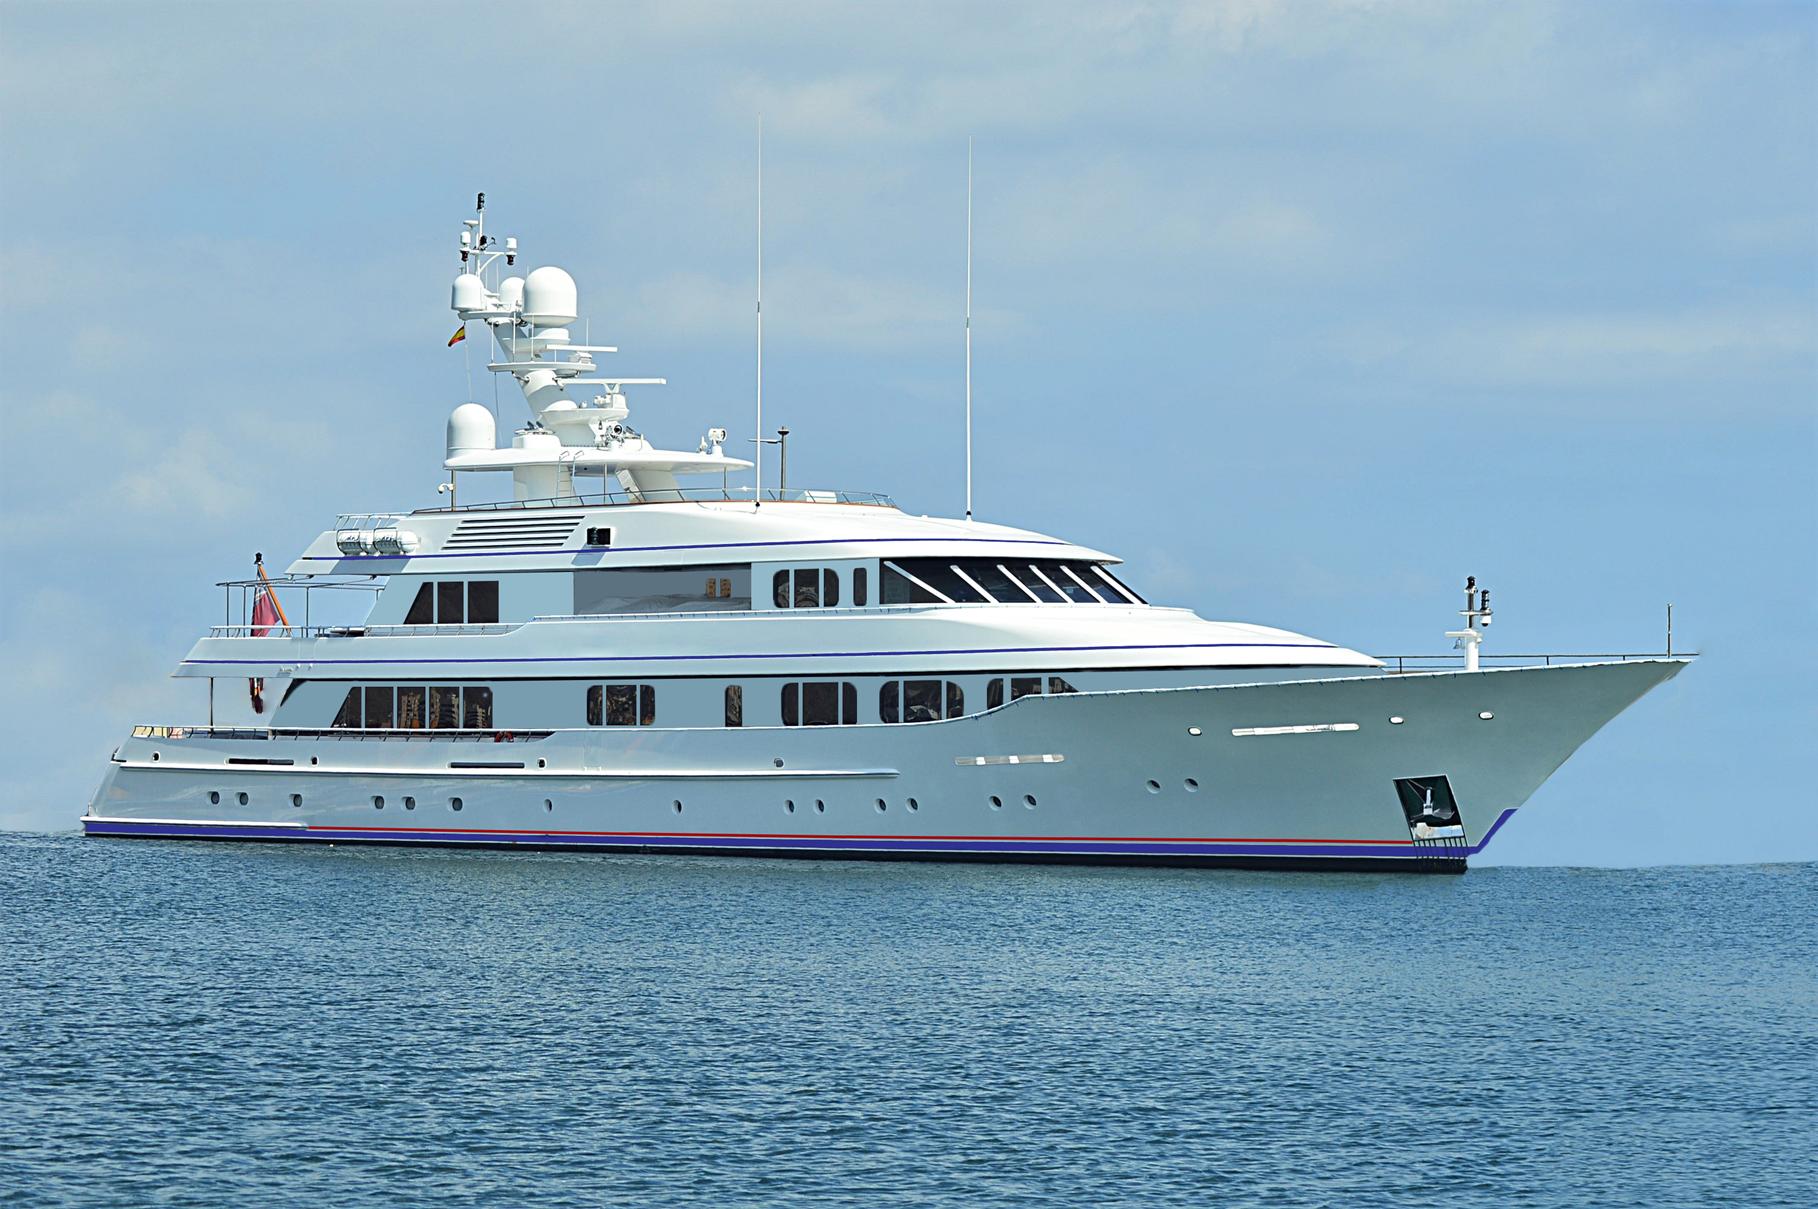 Luxury motor yacht CYNTHIA